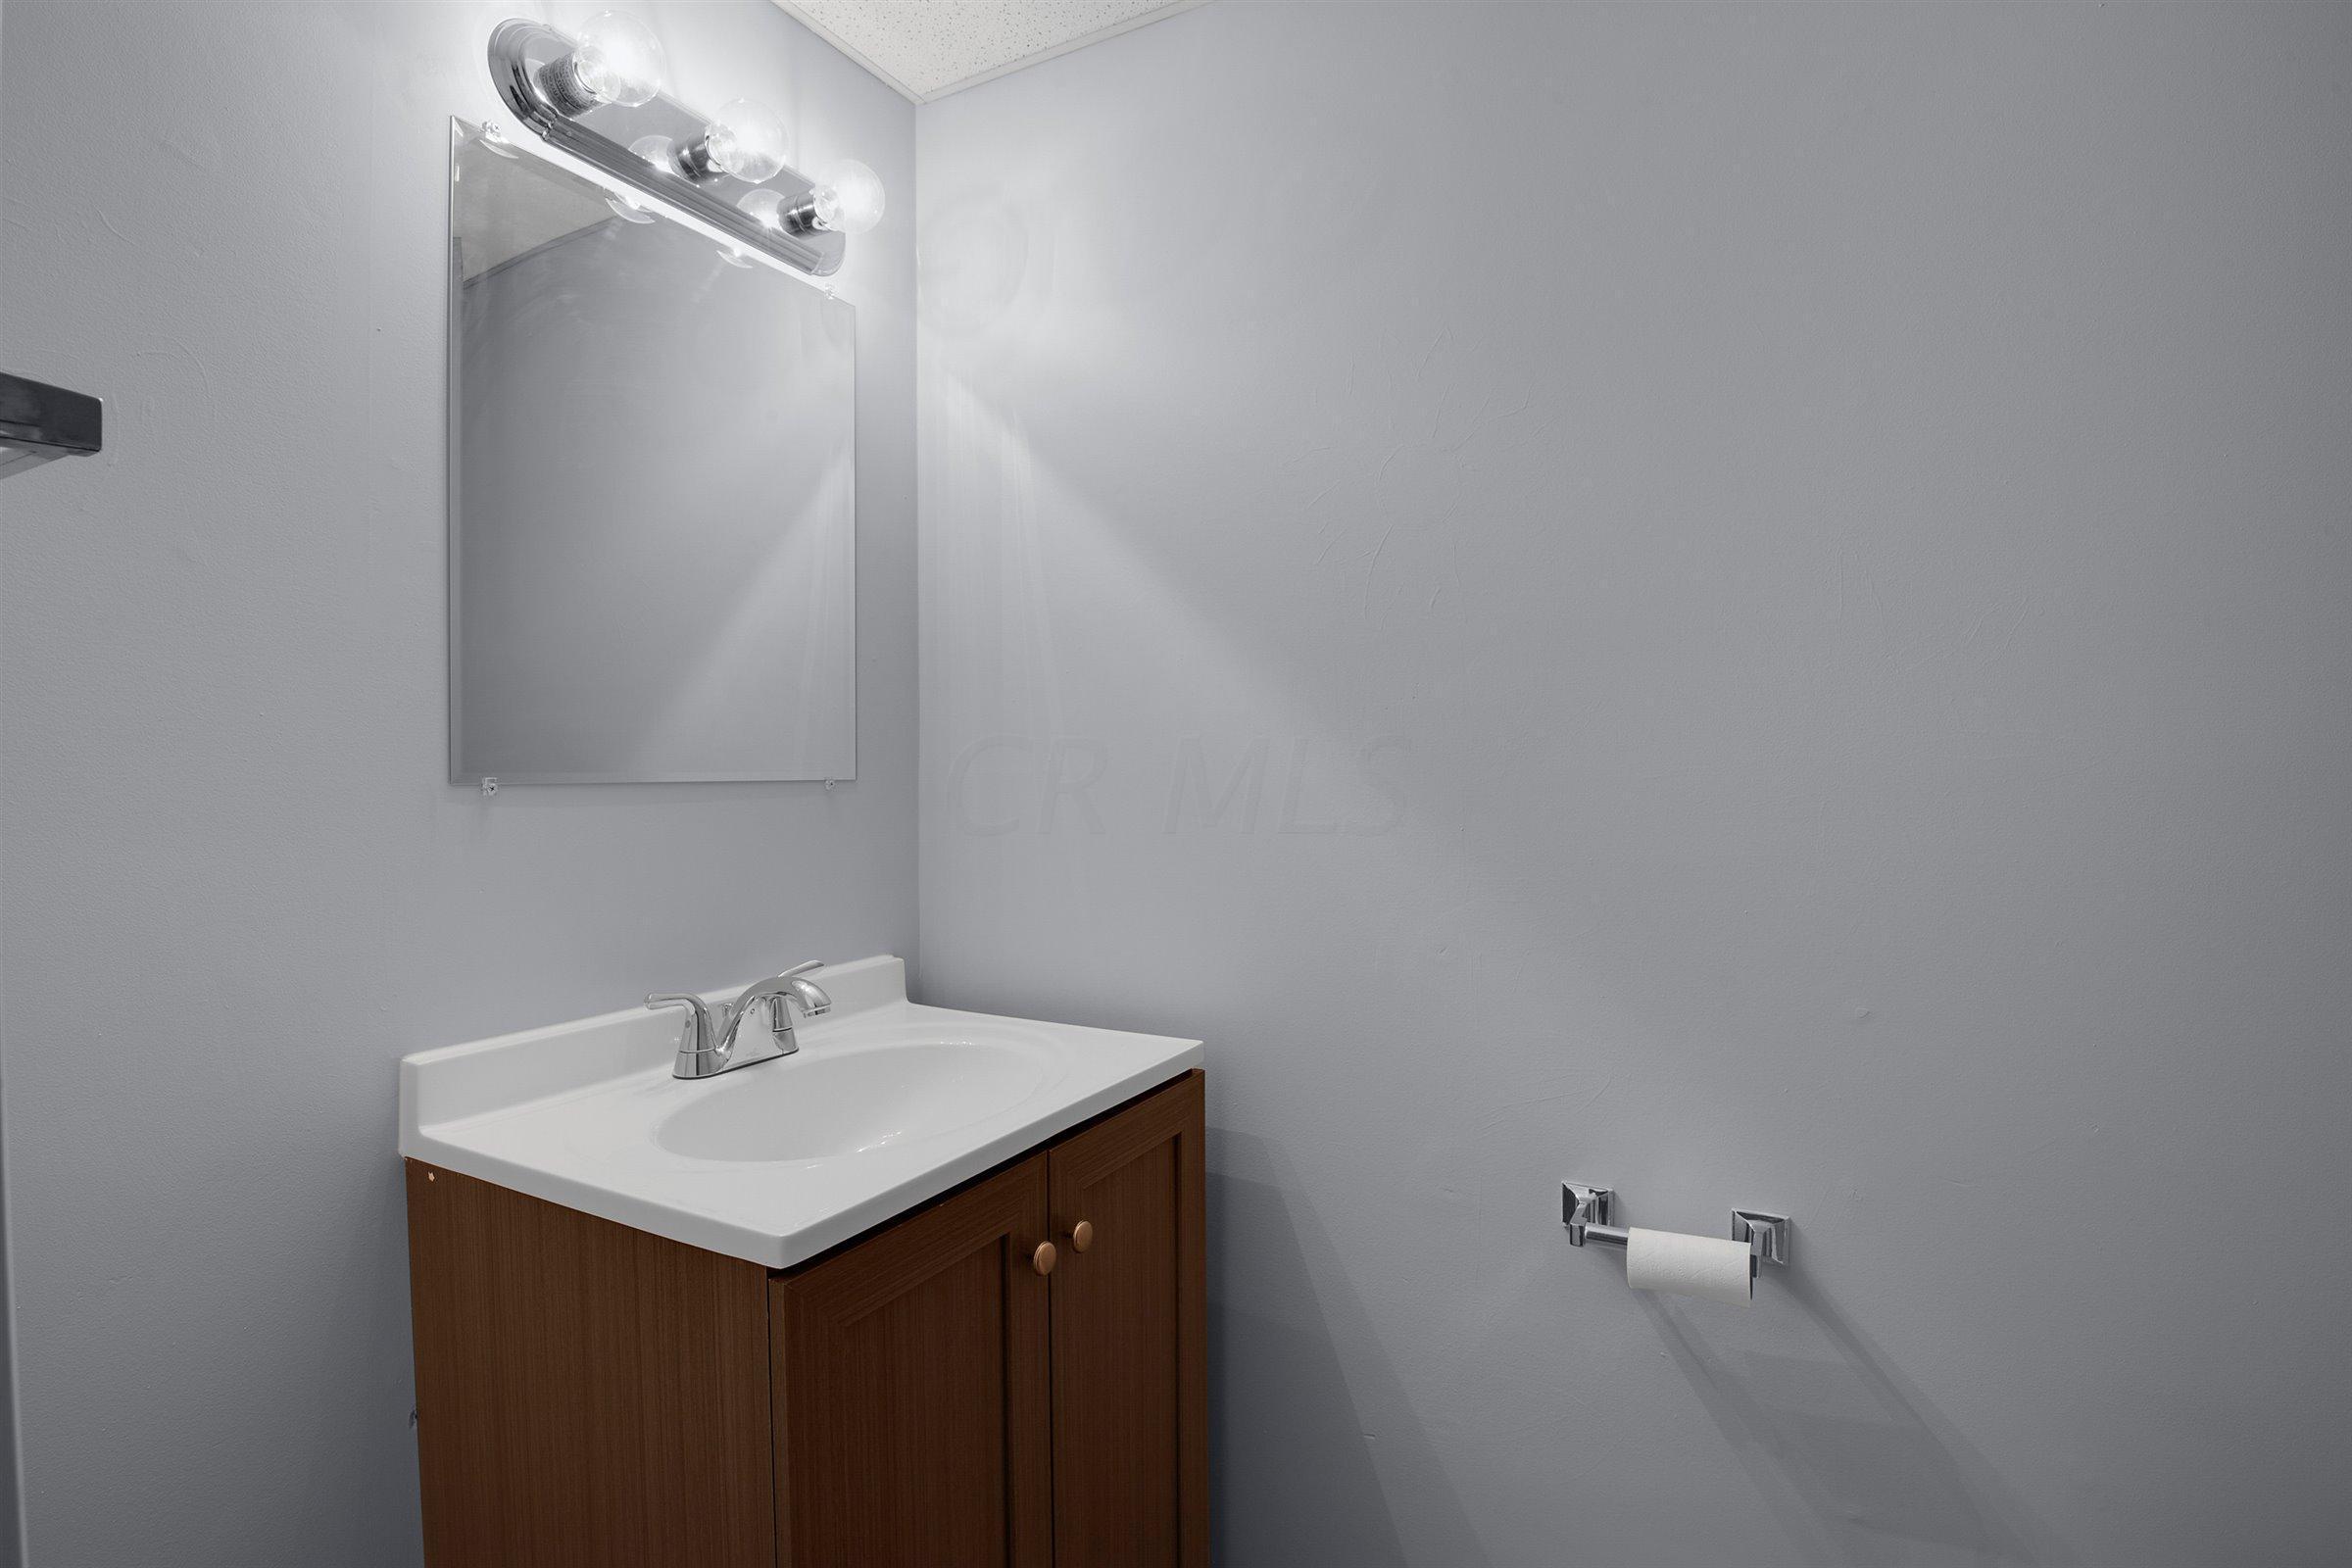 4917 Singleton Drive, Hilliard, Ohio 43026, 2 Bedrooms Bedrooms, ,2 BathroomsBathrooms,Residential,For Sale,Singleton,220040318